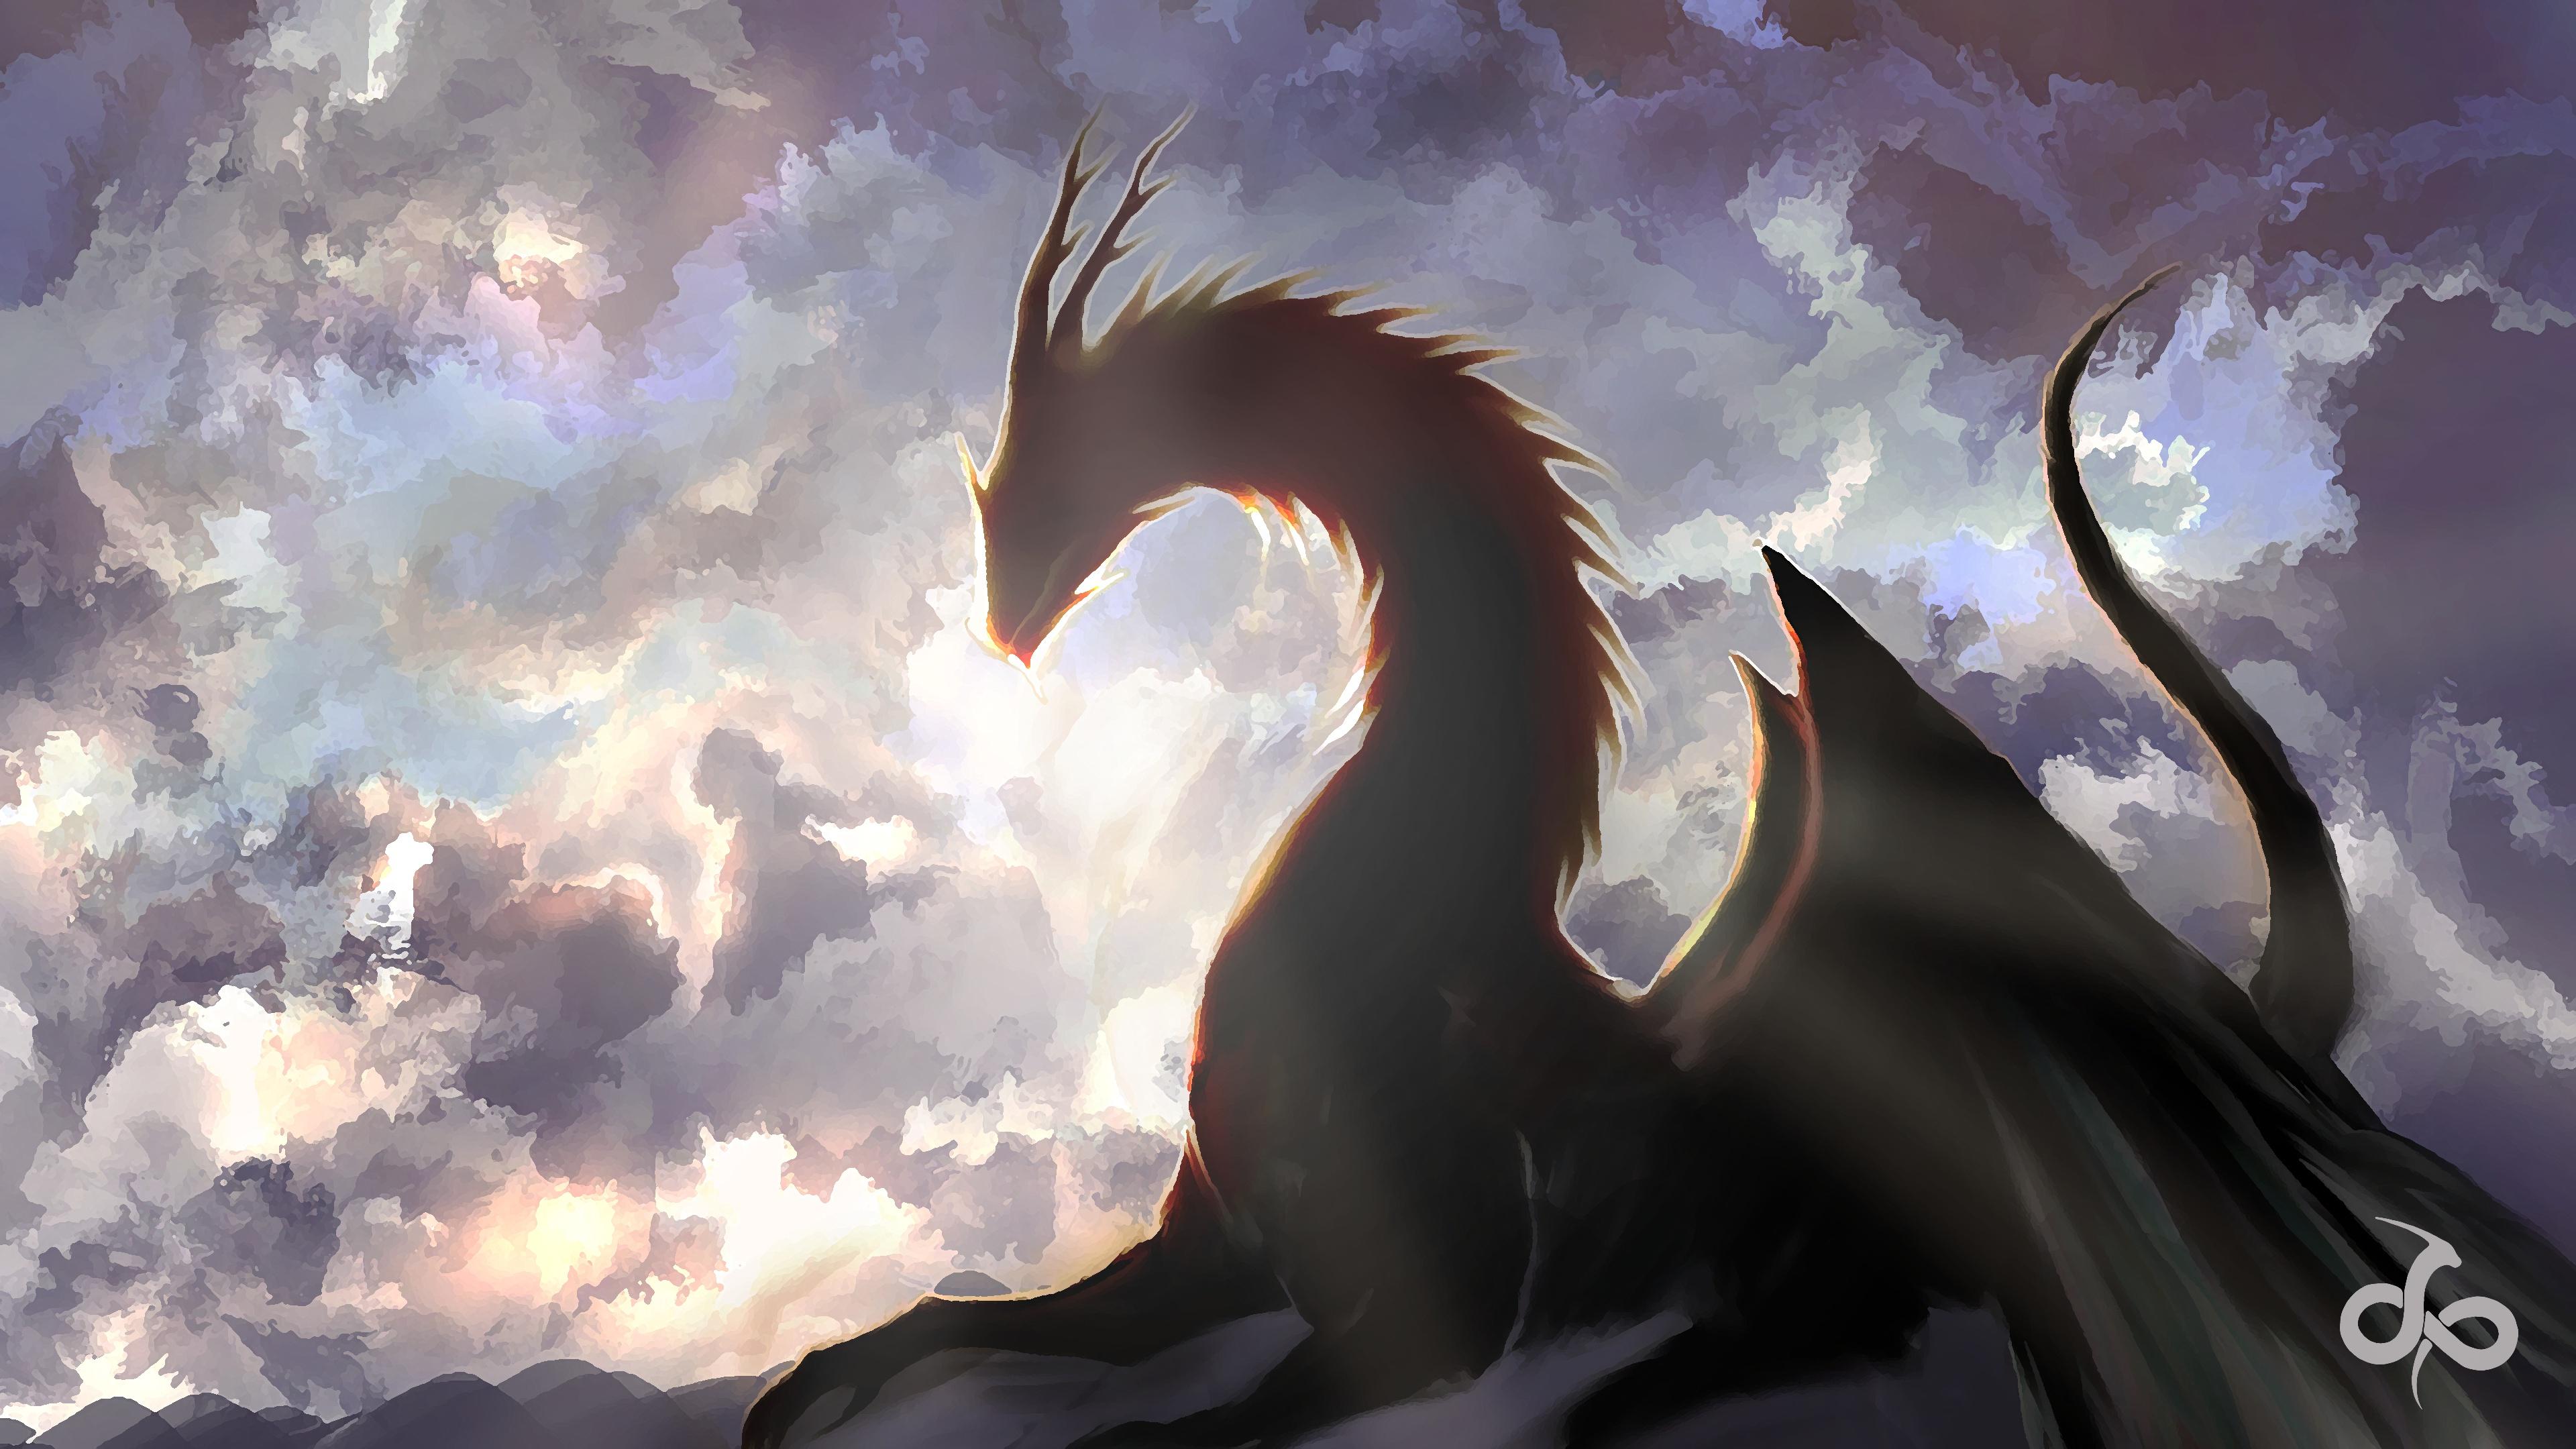 Fantasy Dragon Wallpaper 4k 3840x2160 Download Hd Wallpaper Wallpapertip